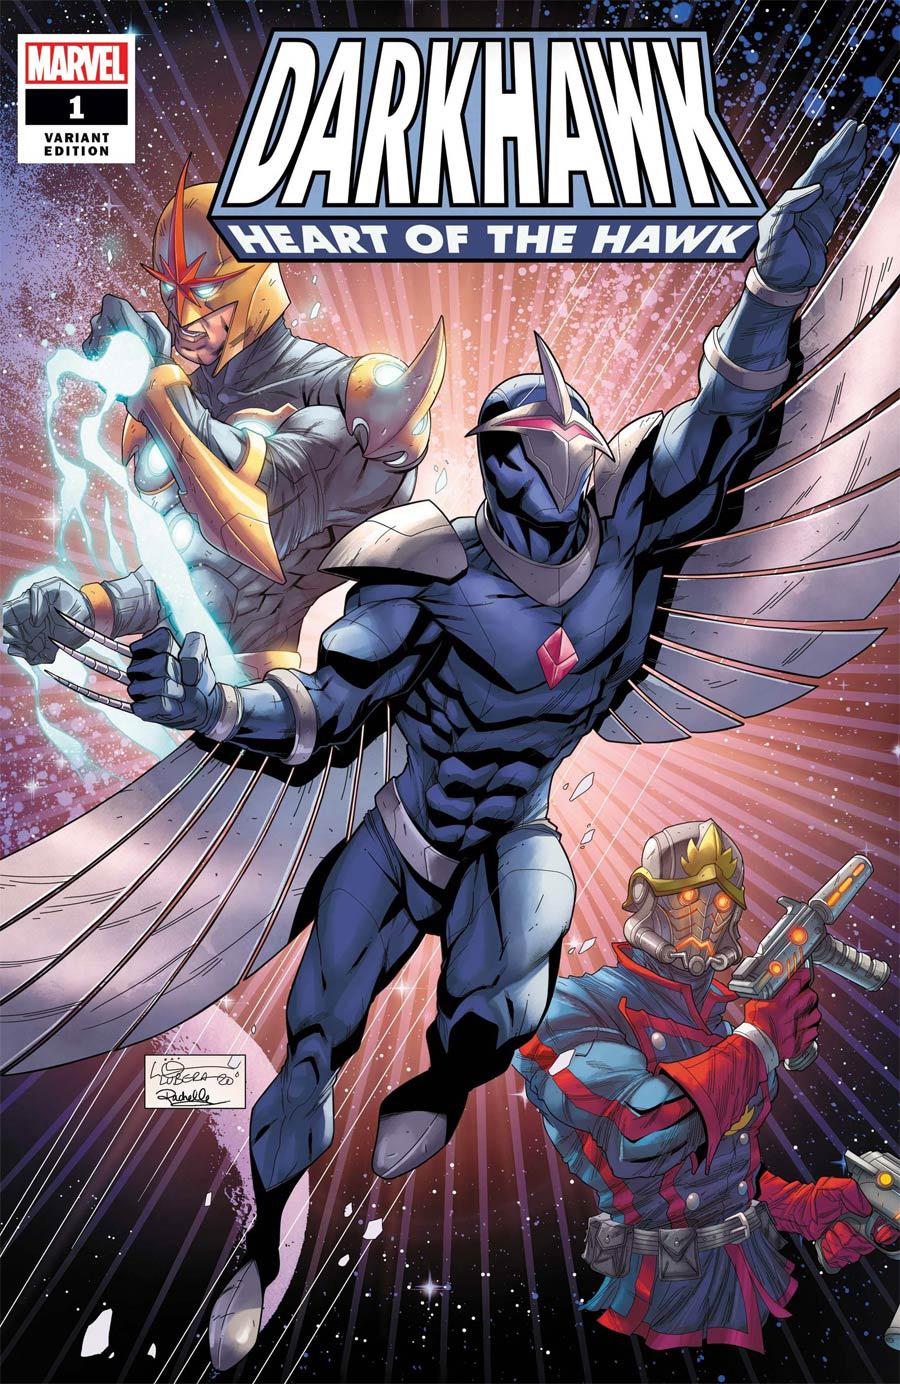 Darkhawk Heart Of The Hawk #1 (One Shot) Cover B Variant Logan Lubera Cover